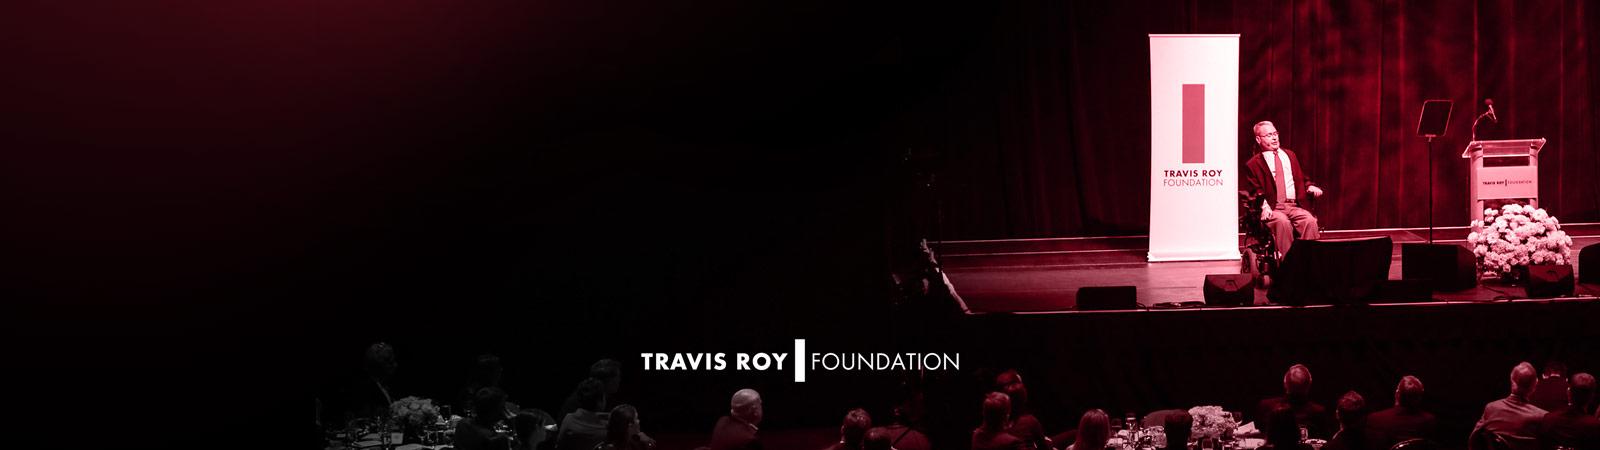 Support Travis Roy Foundation